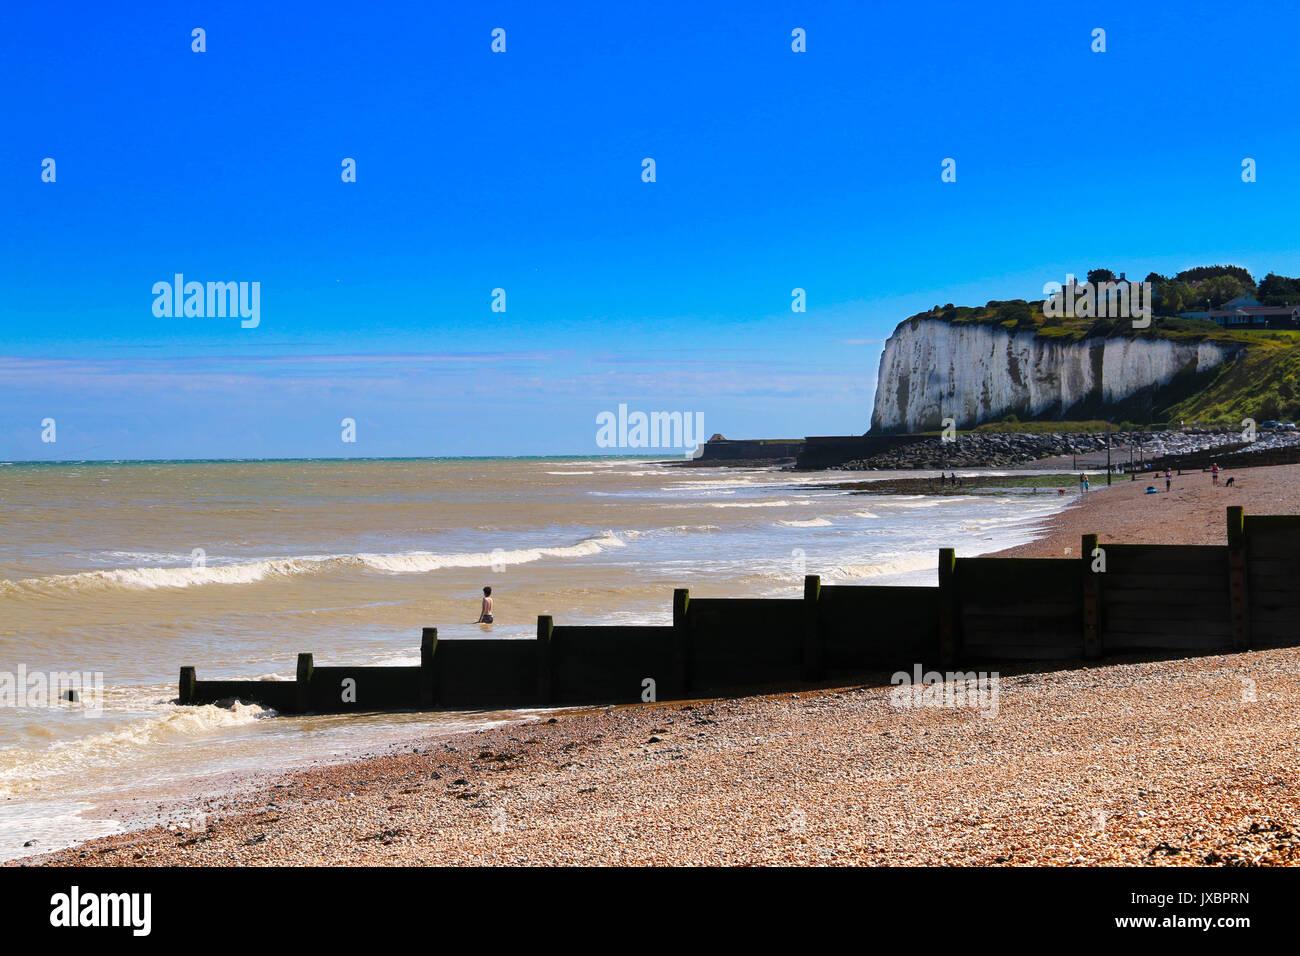 Kingsdown Beach, Kent - Stock Image